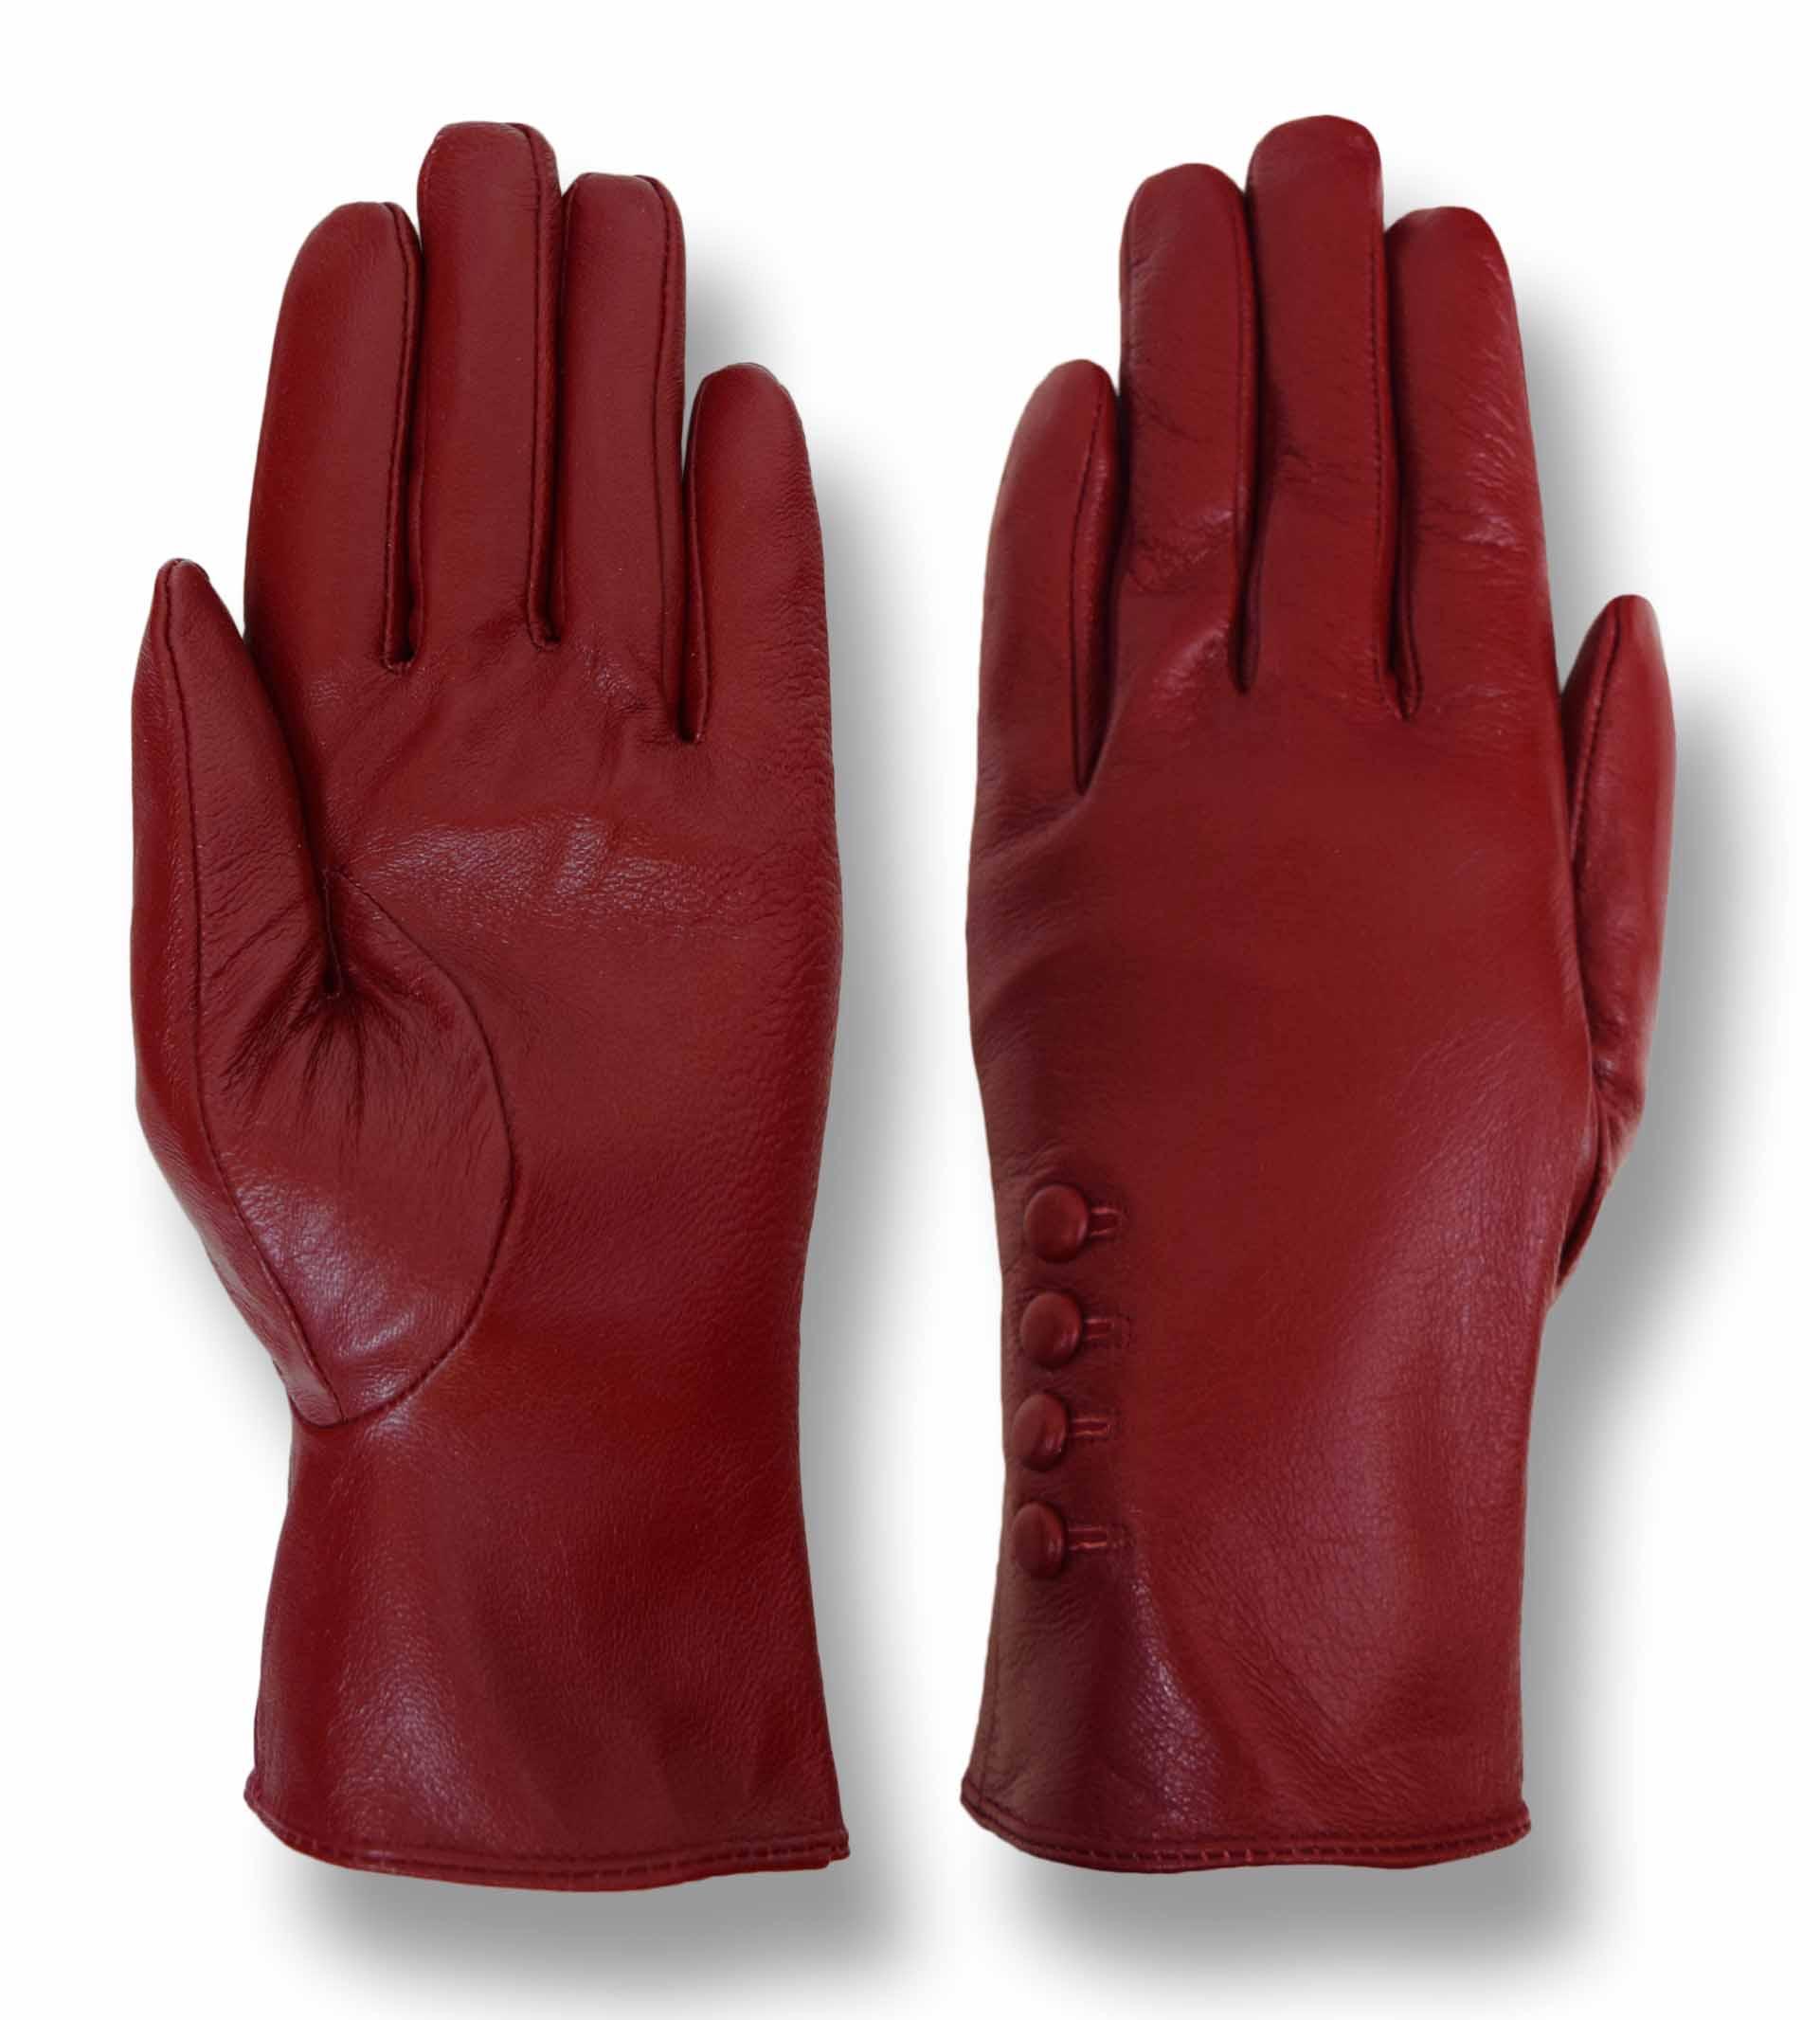 Fingerless driving gloves ebay - Picture 3 Of 8